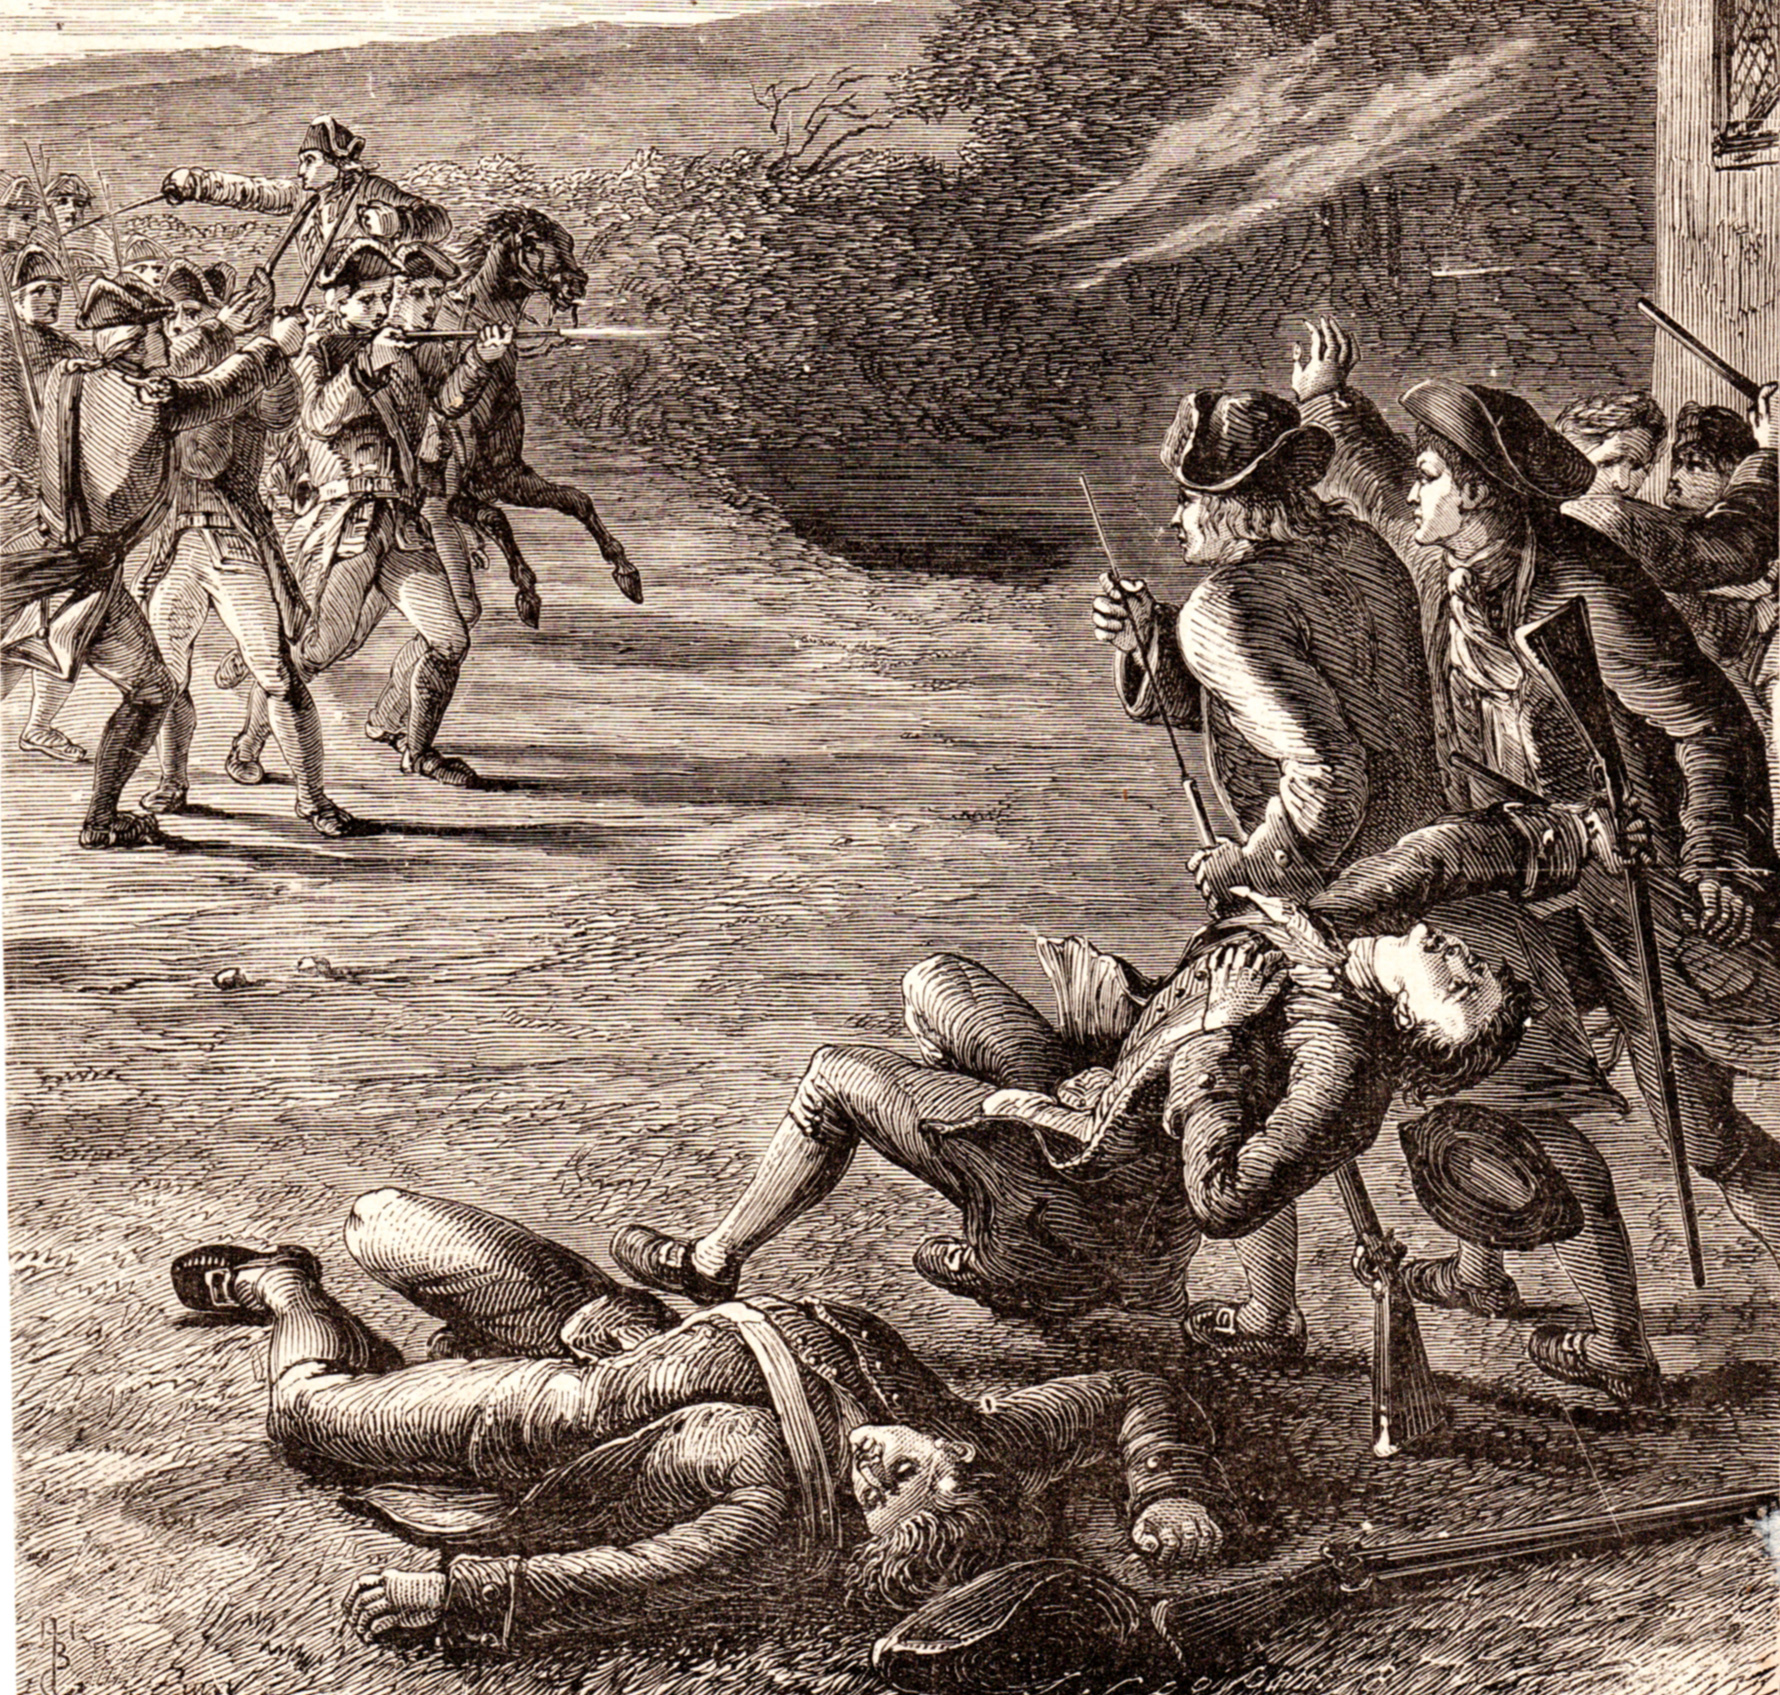 US Revolutionary War scenes and portraits